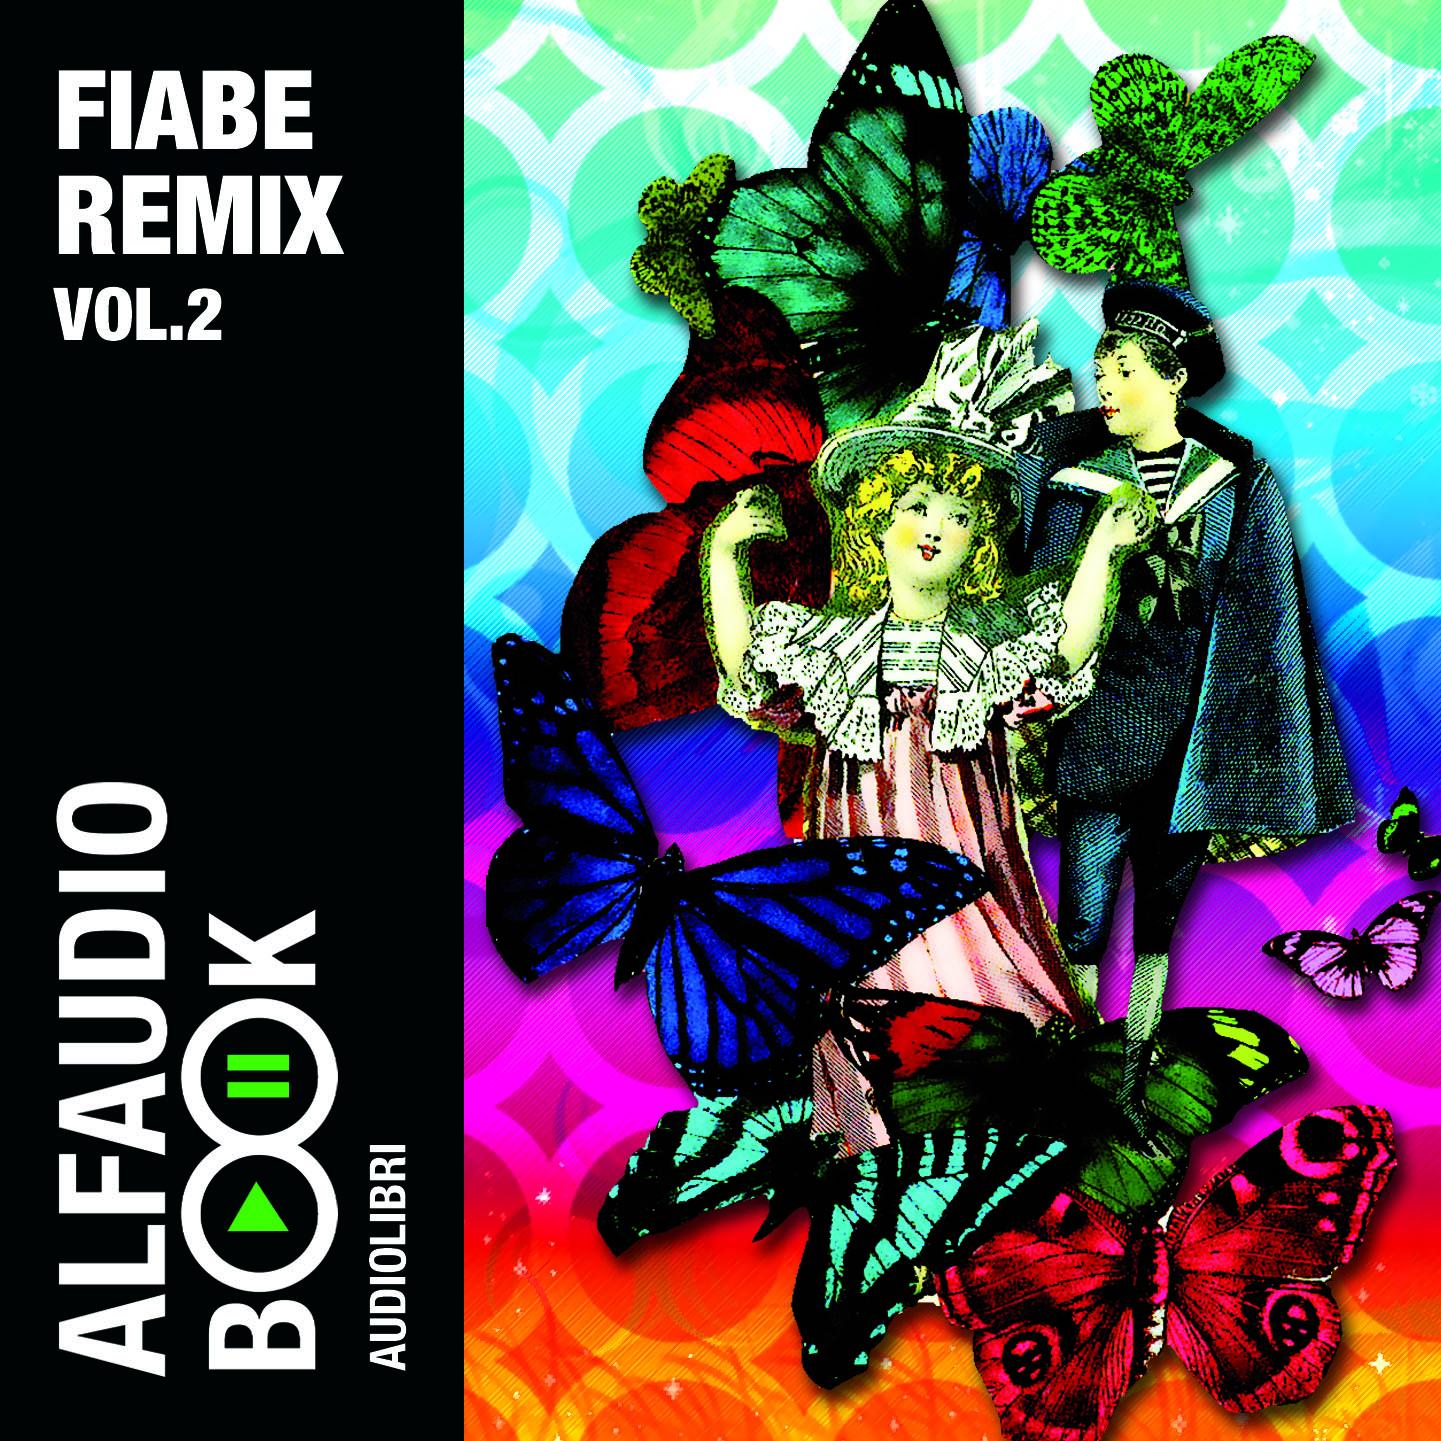 Fiabe remix. Audiolibro. CD Audio. Vol. 2